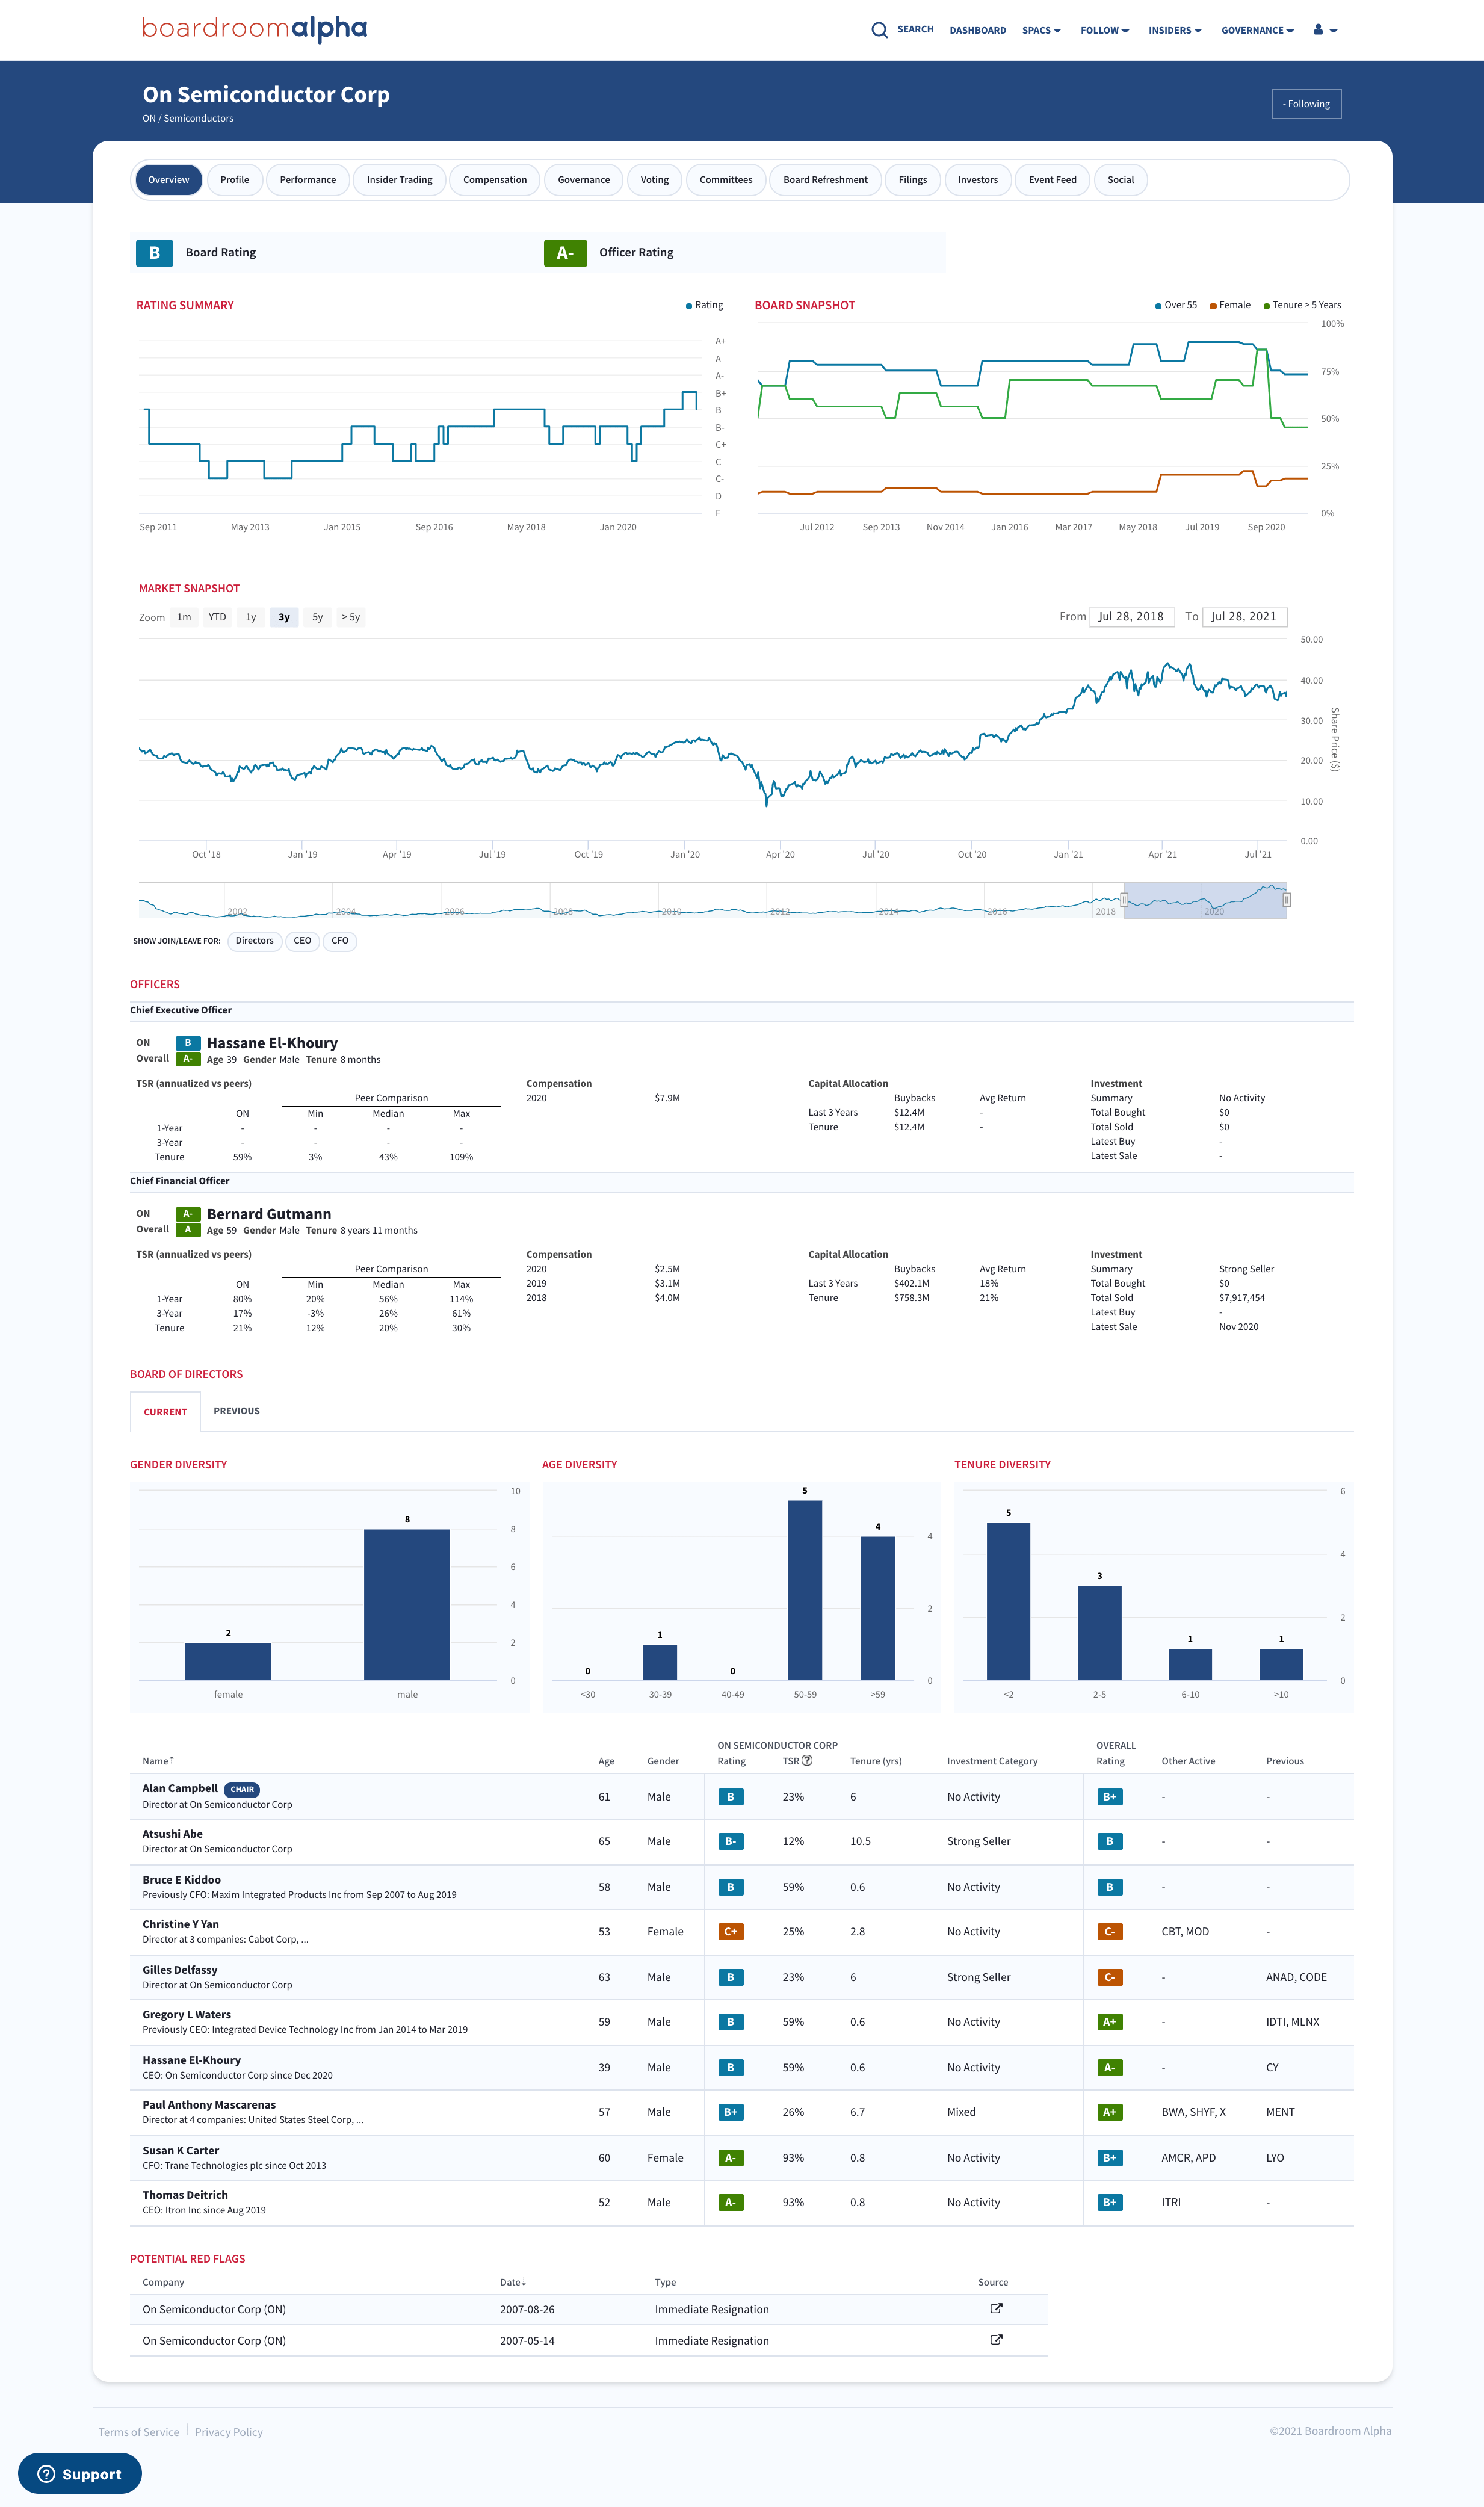 Boardroom Alpha Company Sample